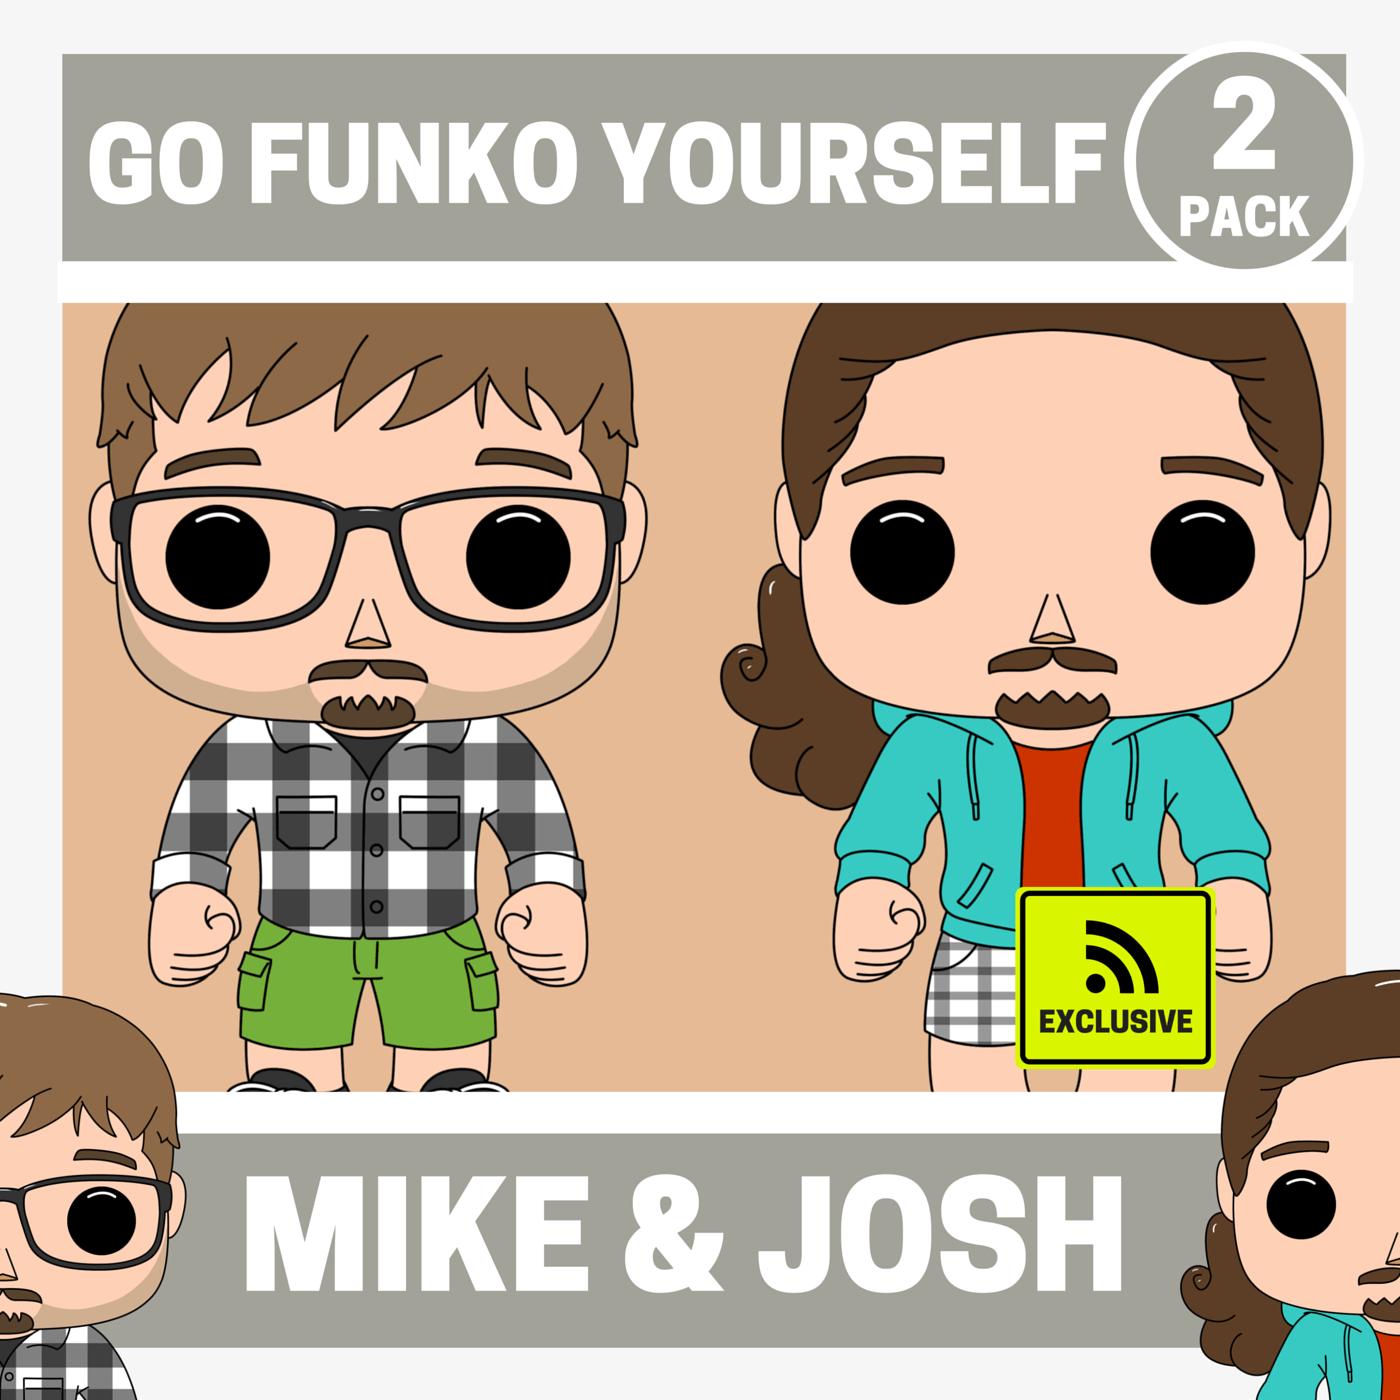 Go Funko Yourself: The Unofficial Funko Podcast logo